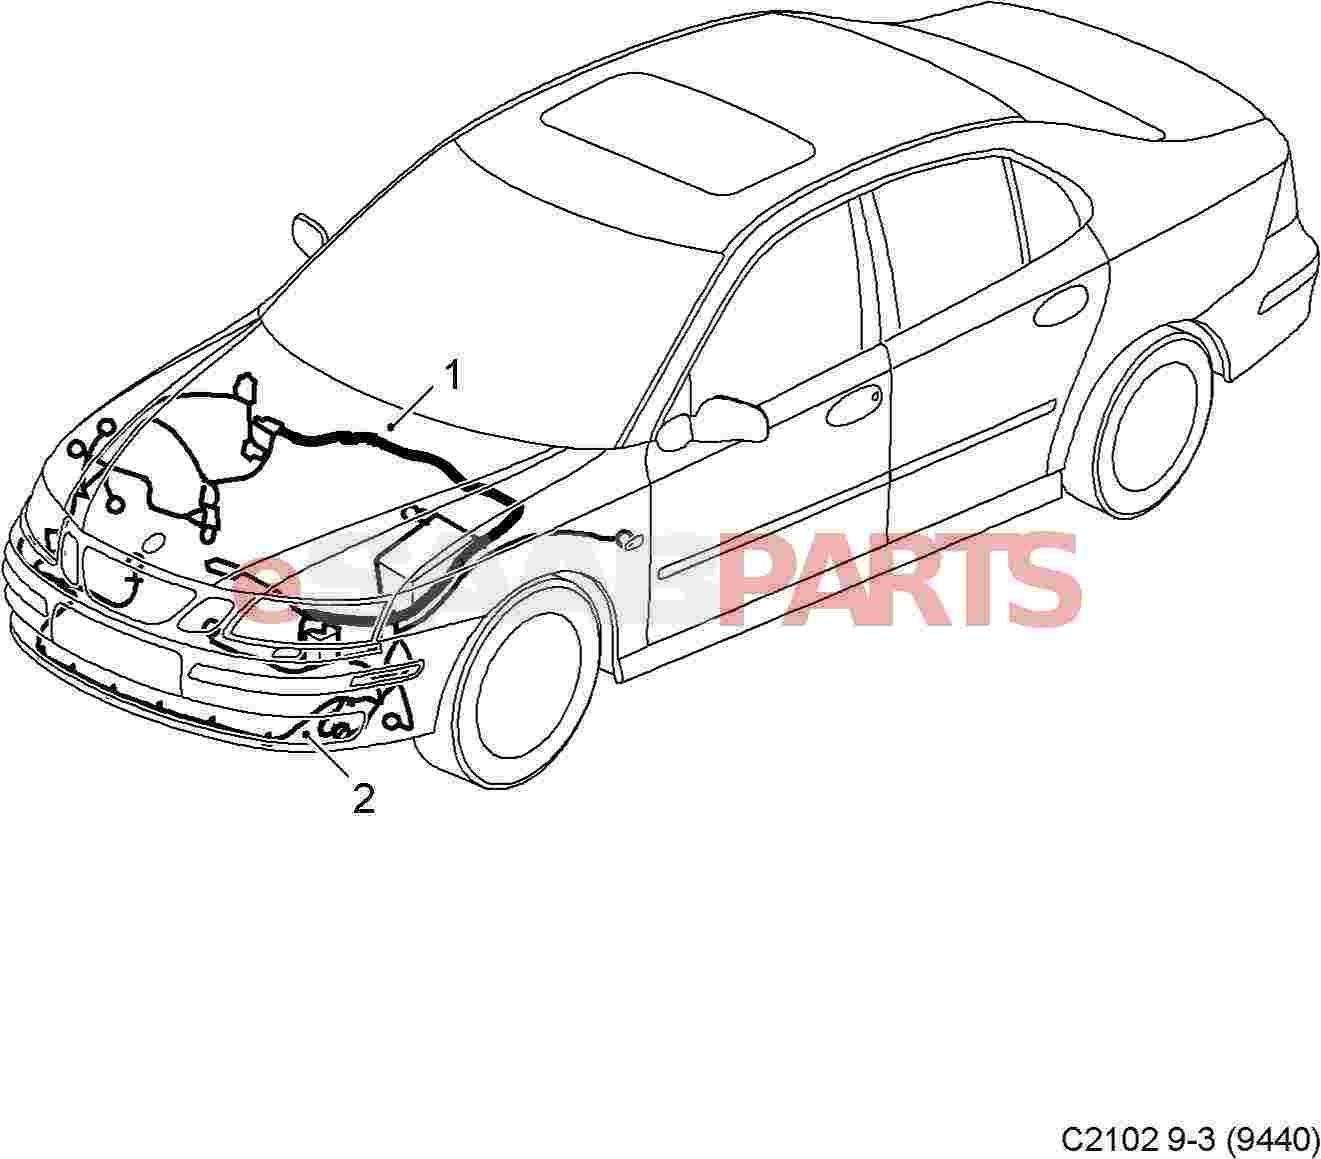 eSaabParts.com - Saab 9-3 (9440) > Electrical Parts > Wiring Harness: Front  Bumper > Front